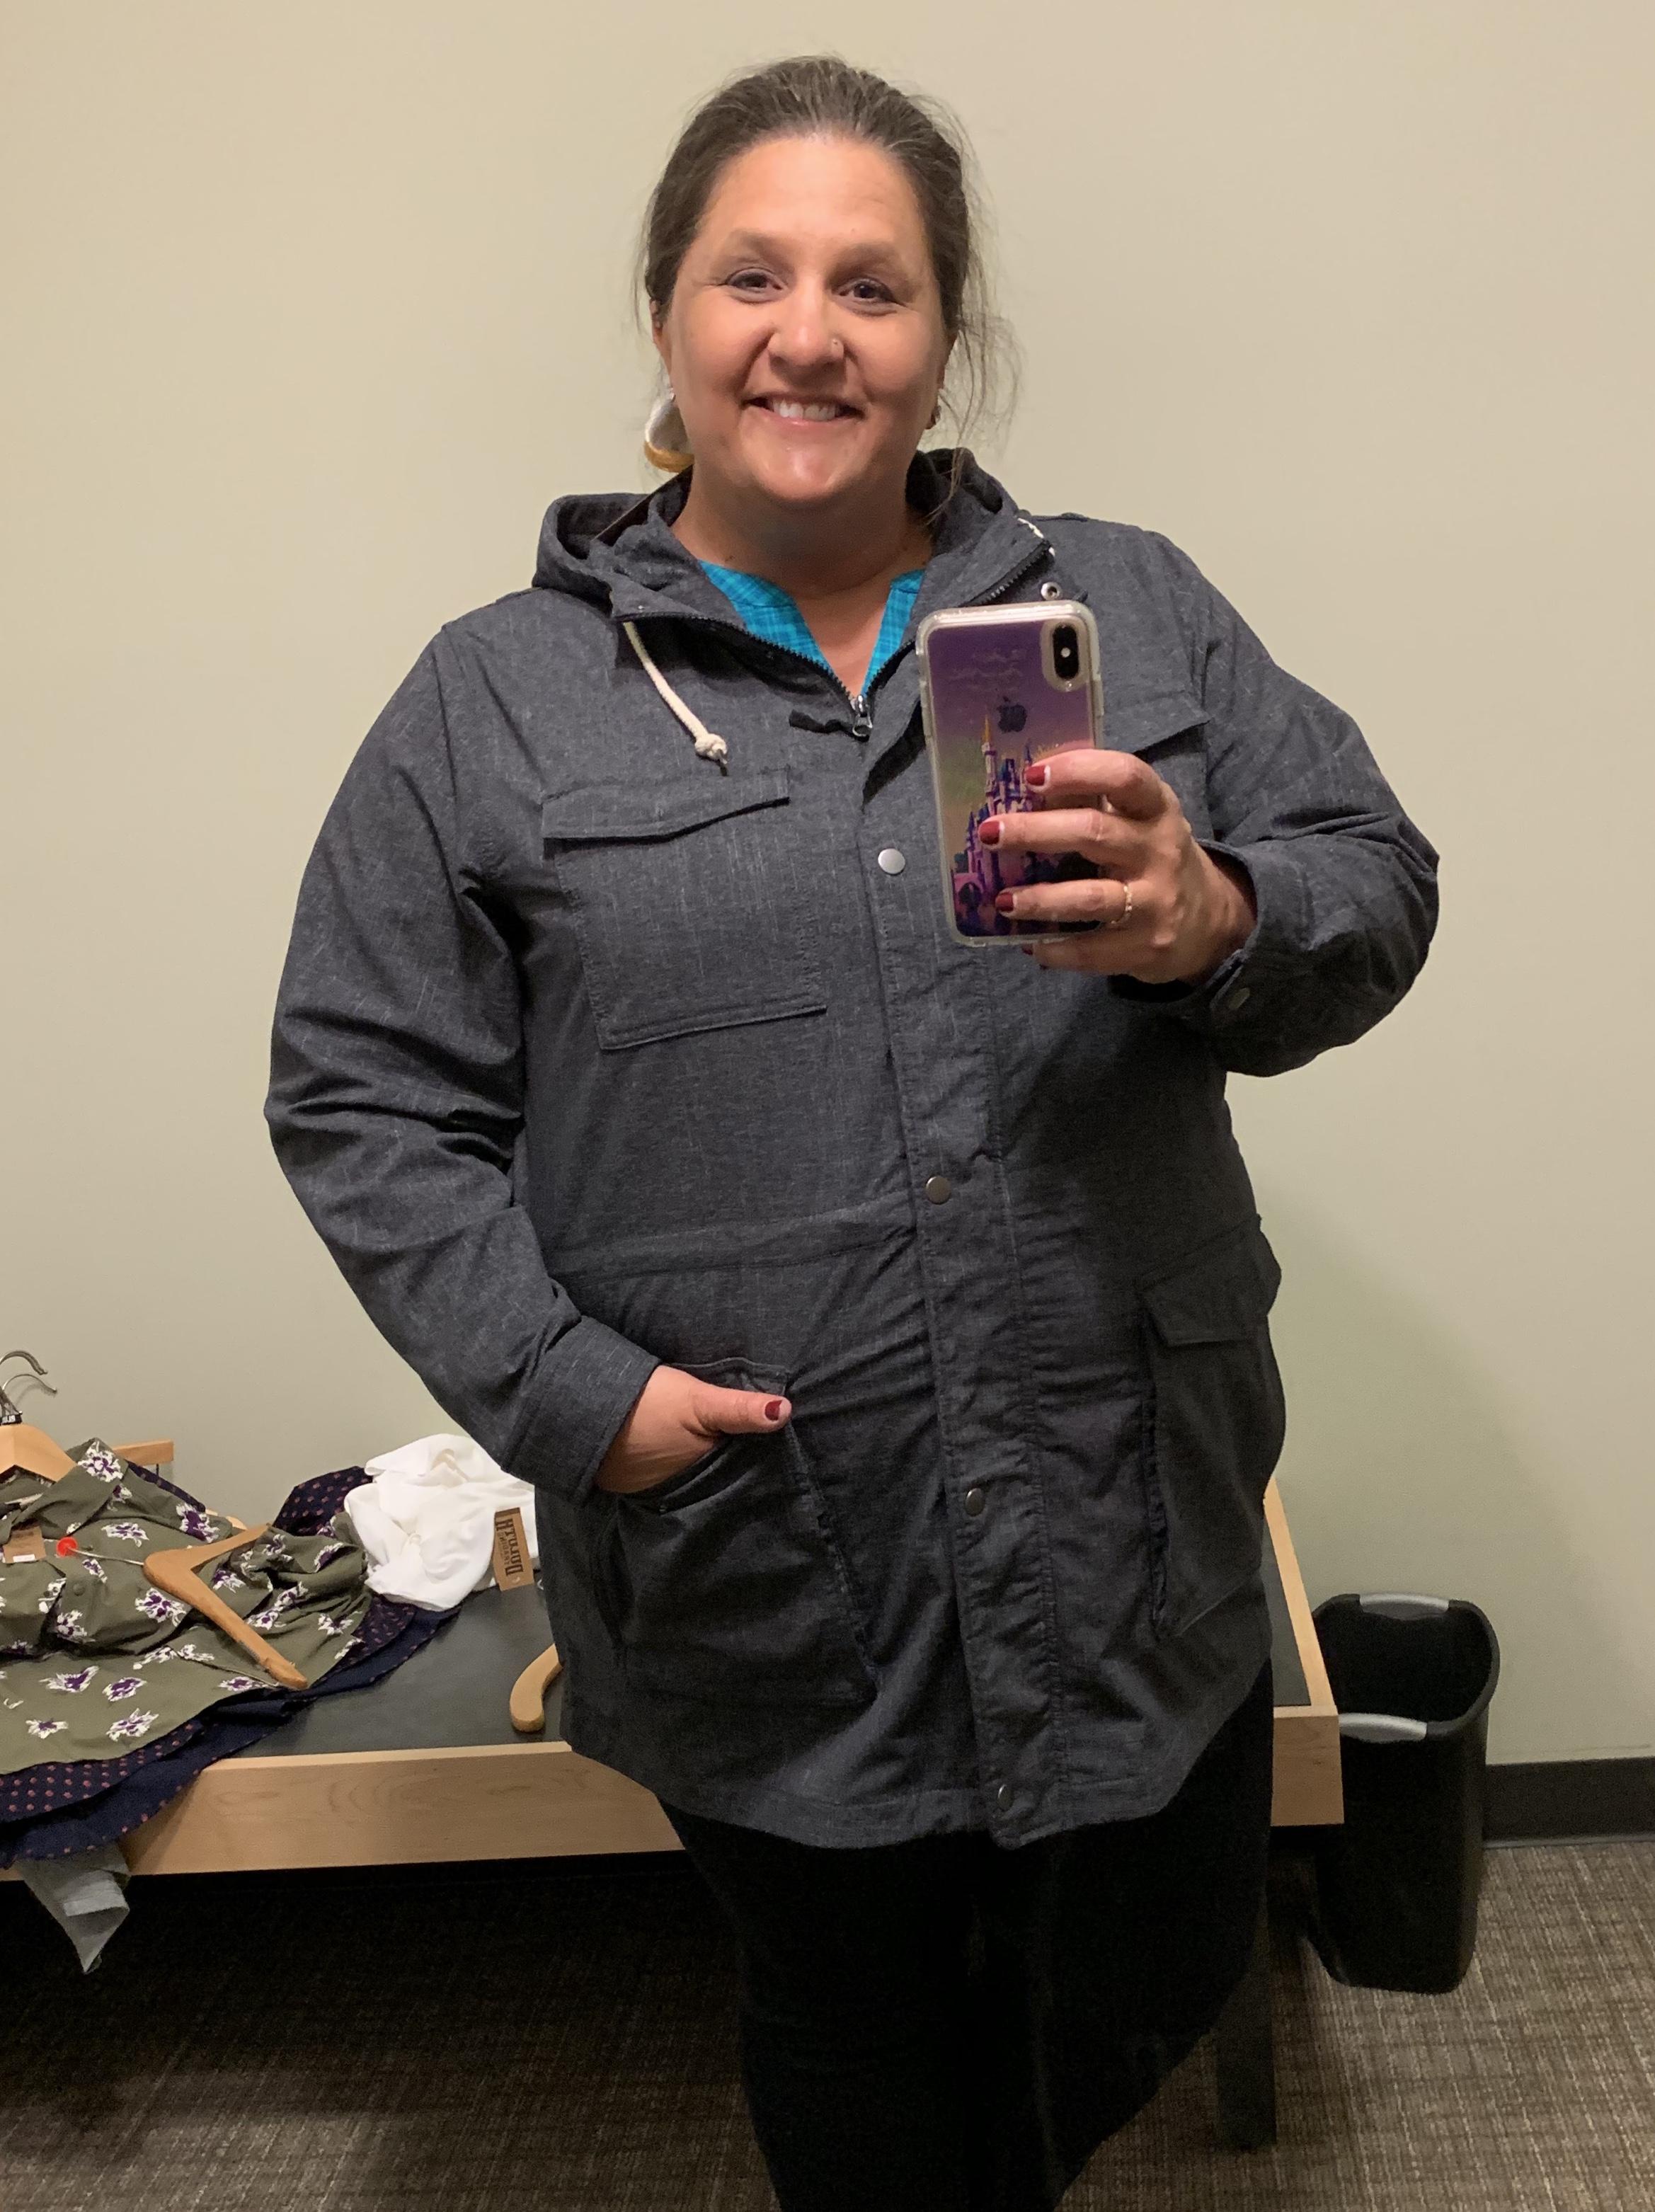 Duluth Trading Company, Plus Size Review, Plus Size Outdoor Gear, Plus Size Blogger, St. Louis Blogger, Plus Size Jacket, Mist Master Jacket